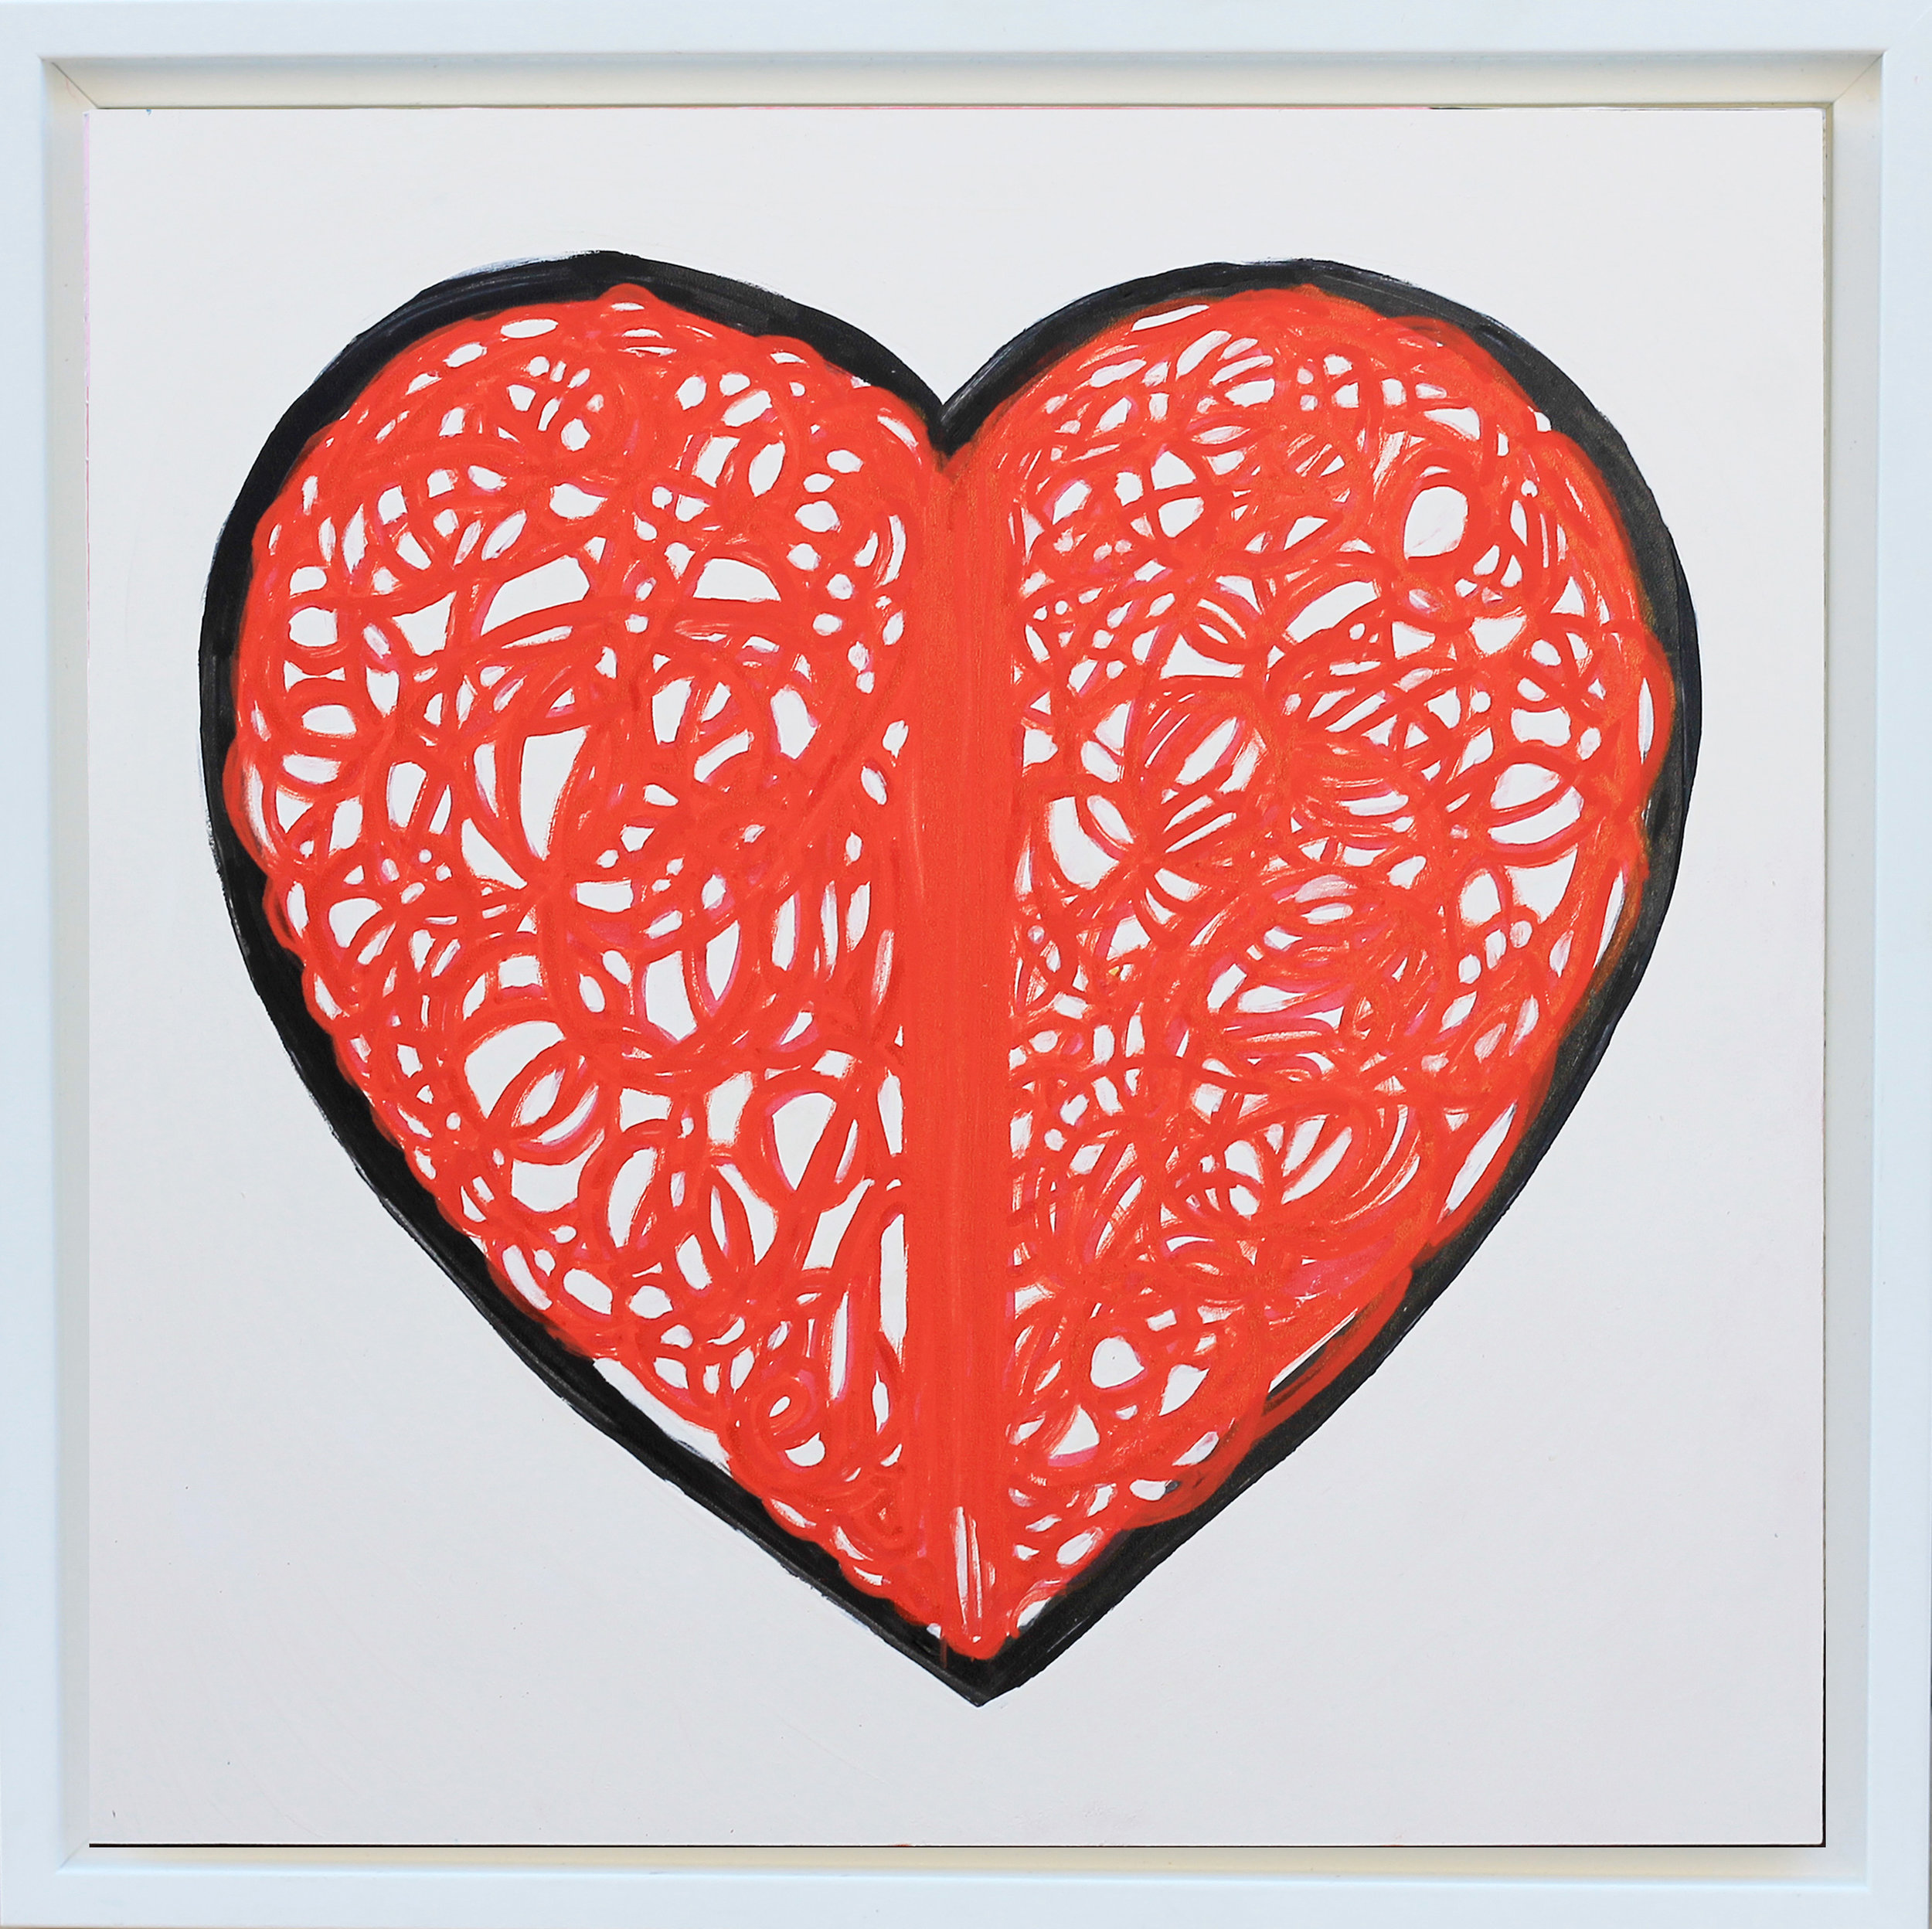 Sarrow_Karen-Heart-07-Acrylic-and-Marker-12-x-12in-IMG_9640.jpg